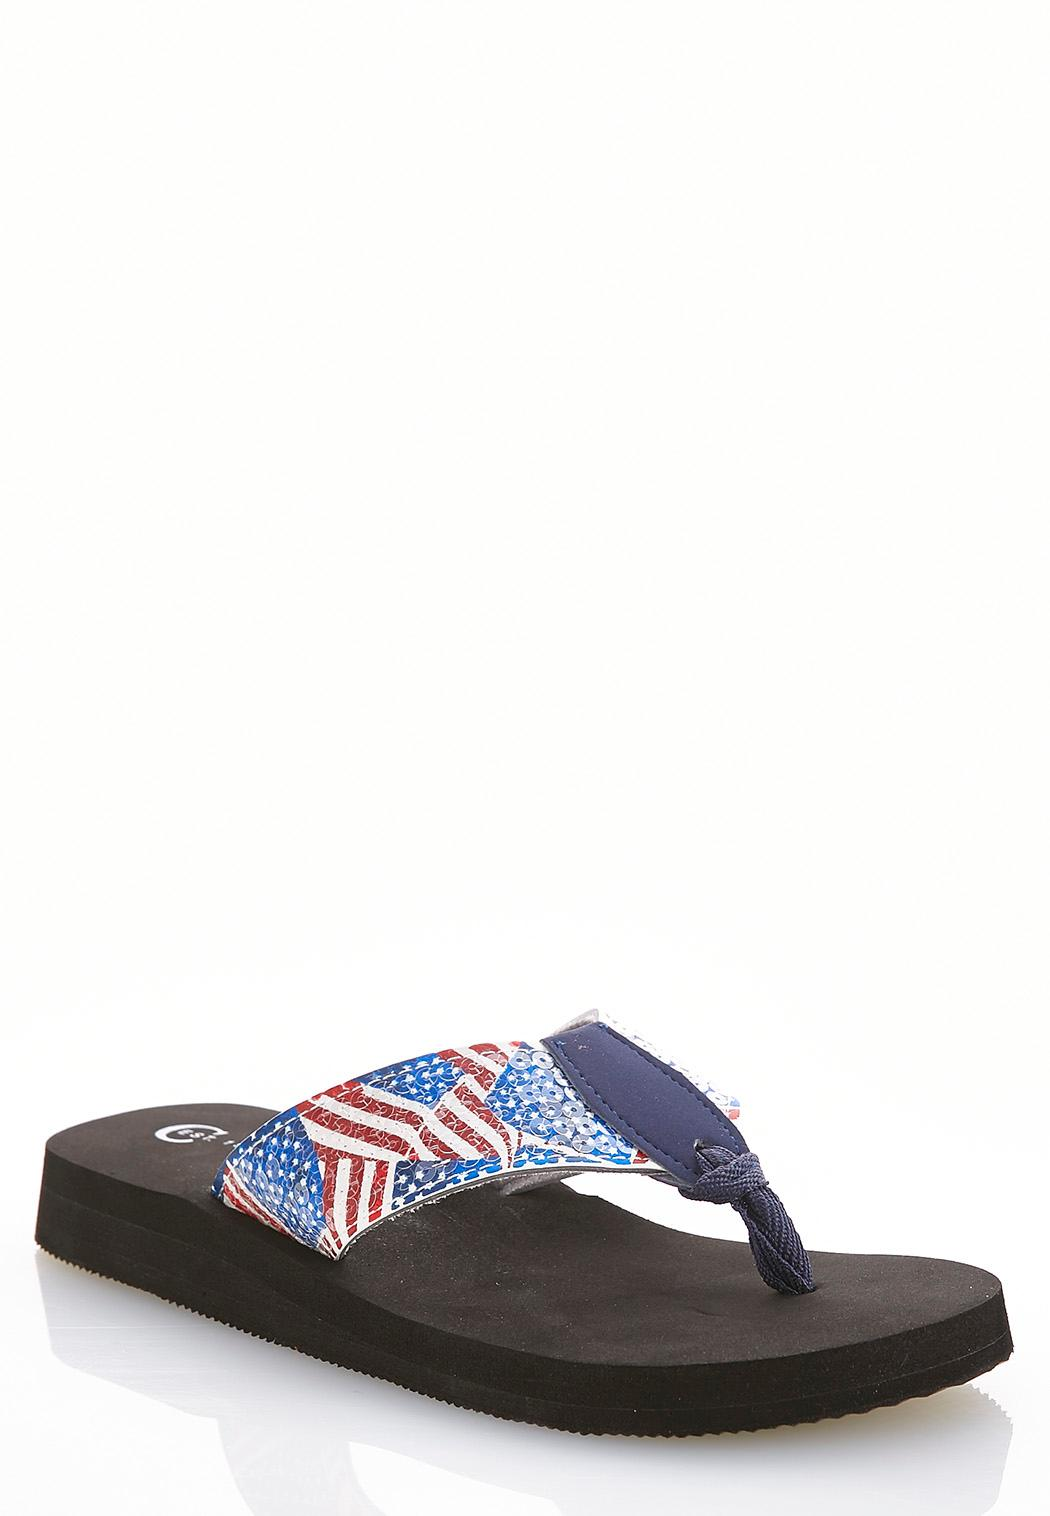 7685f395e Women s Flip Flops